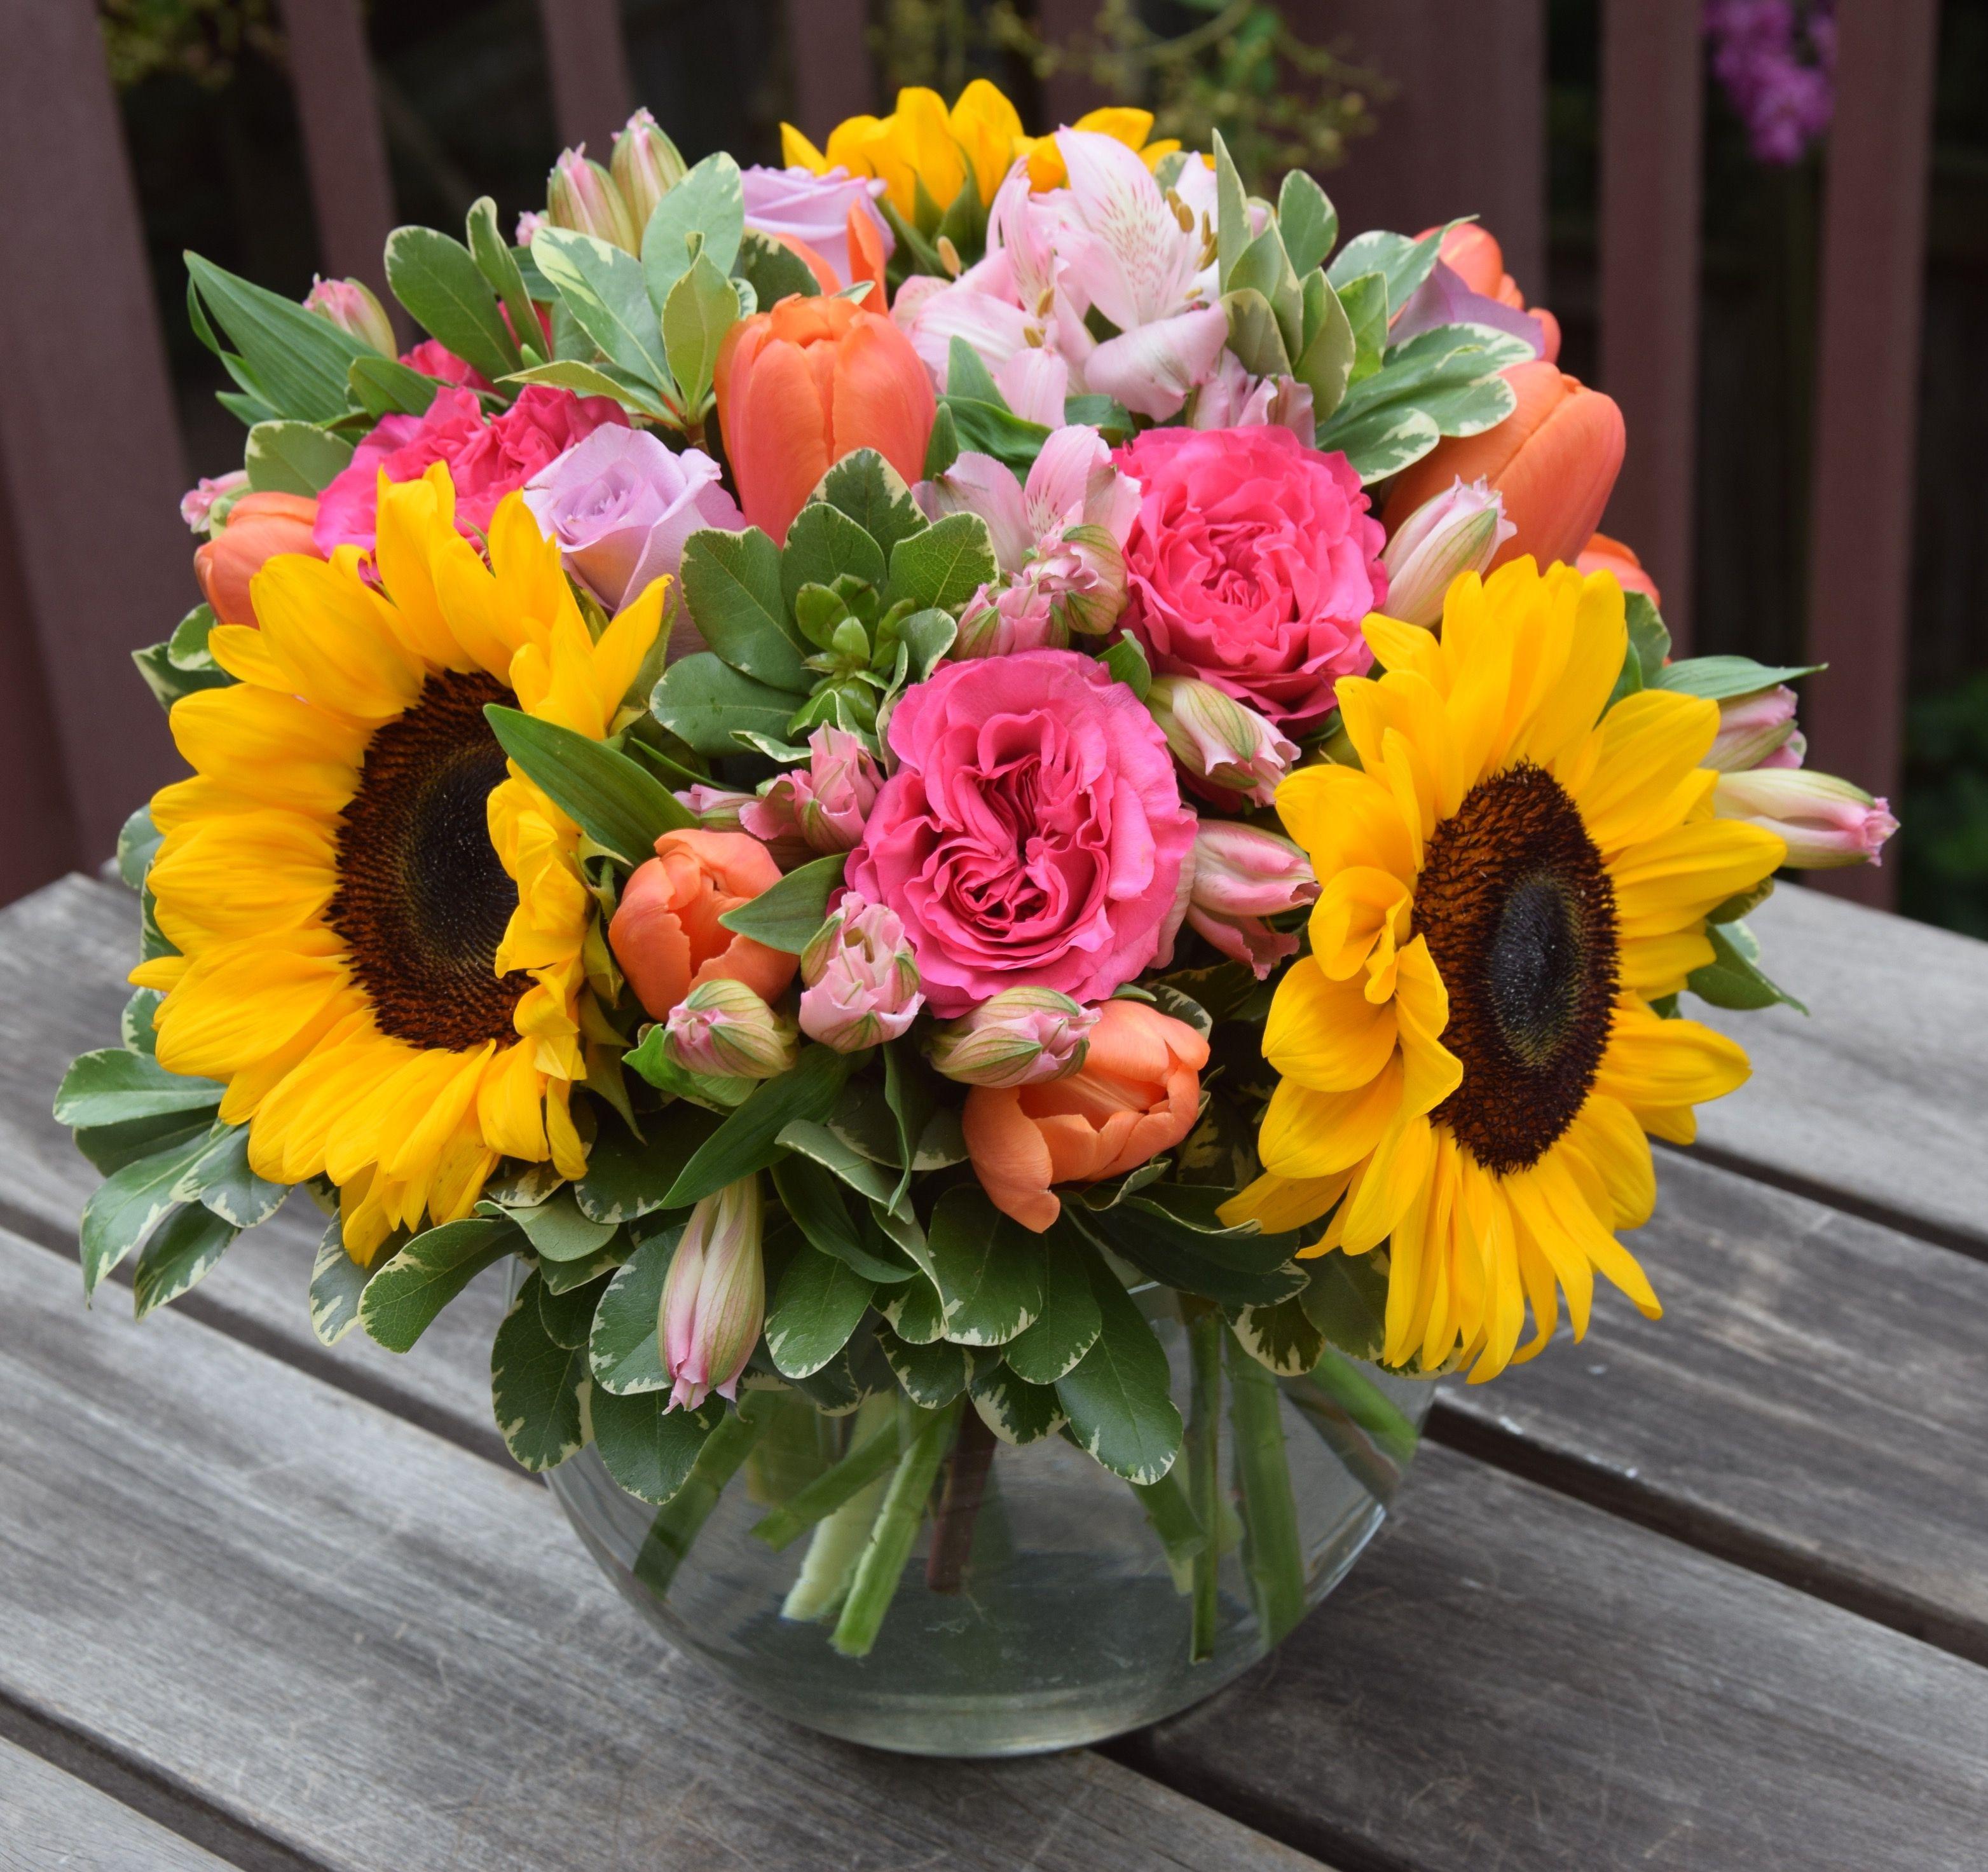 Flower arrangement with sunflowers garden roses tulips alstroemerias